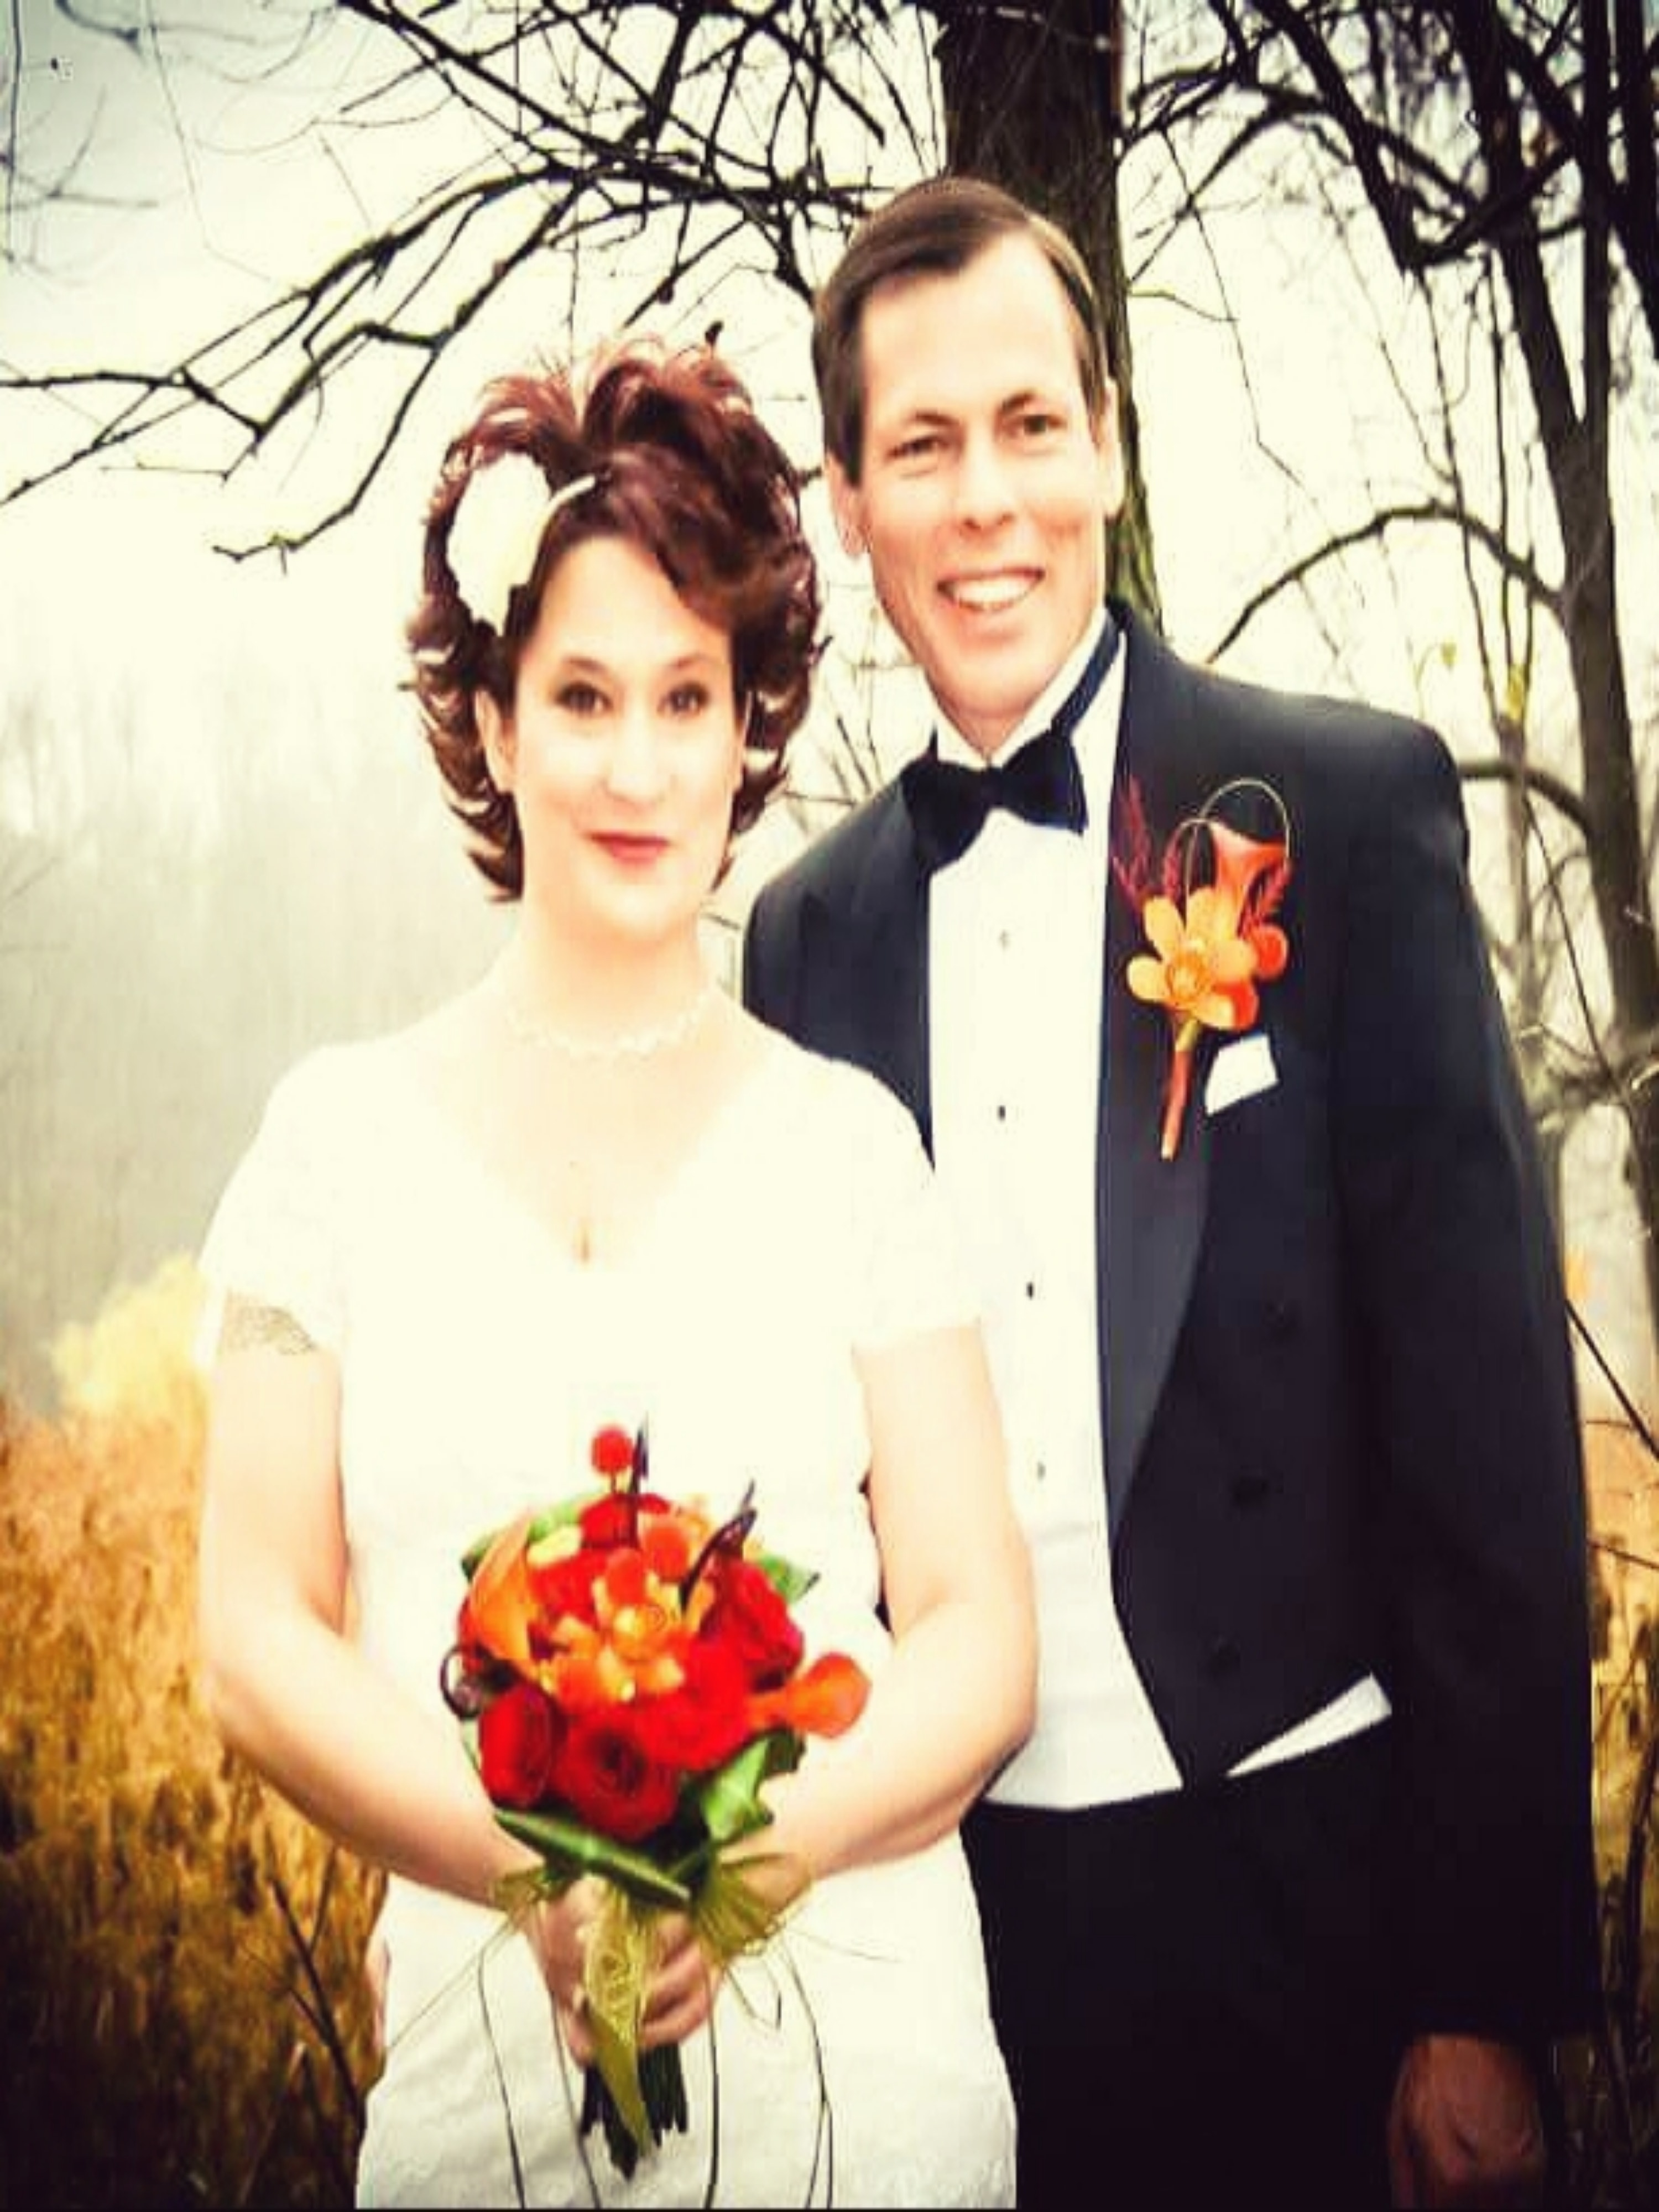 Free stock photo of #wedding #fall #love #bride #groom #heart